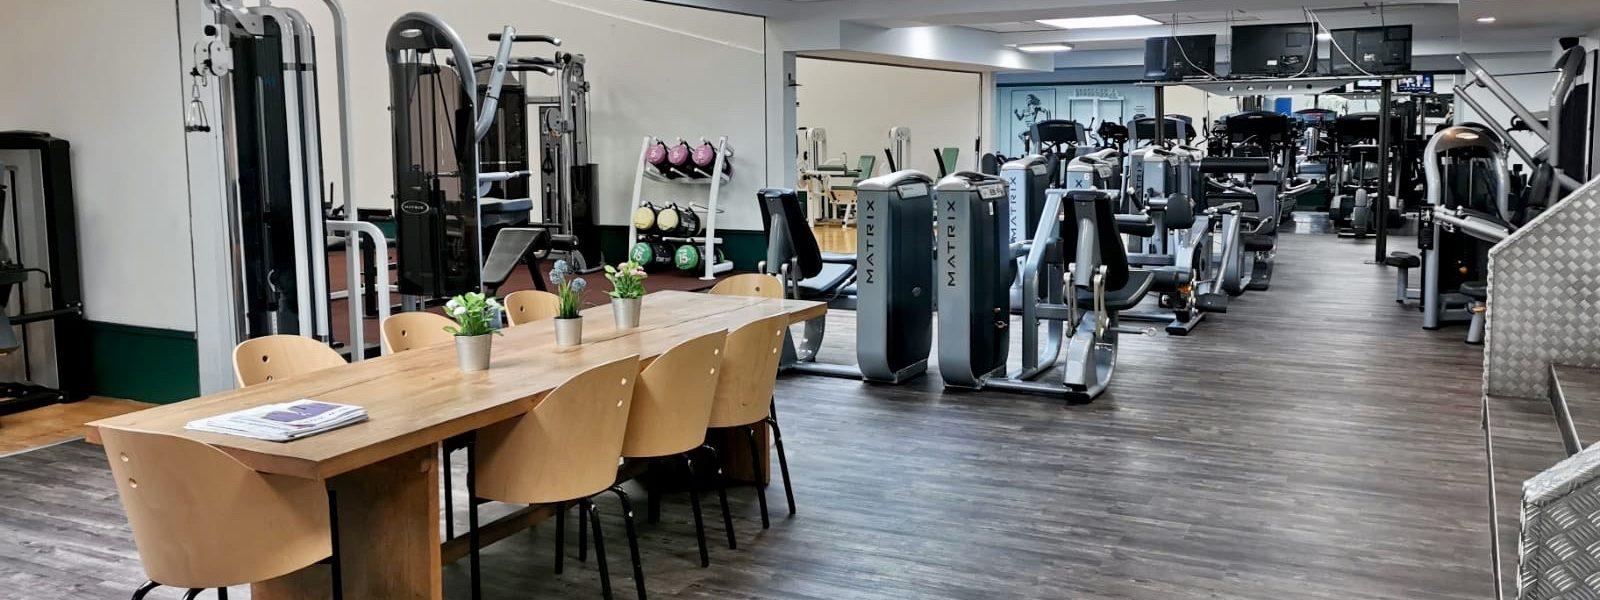 Fitness Studio Neuss Training Fitnessstudio